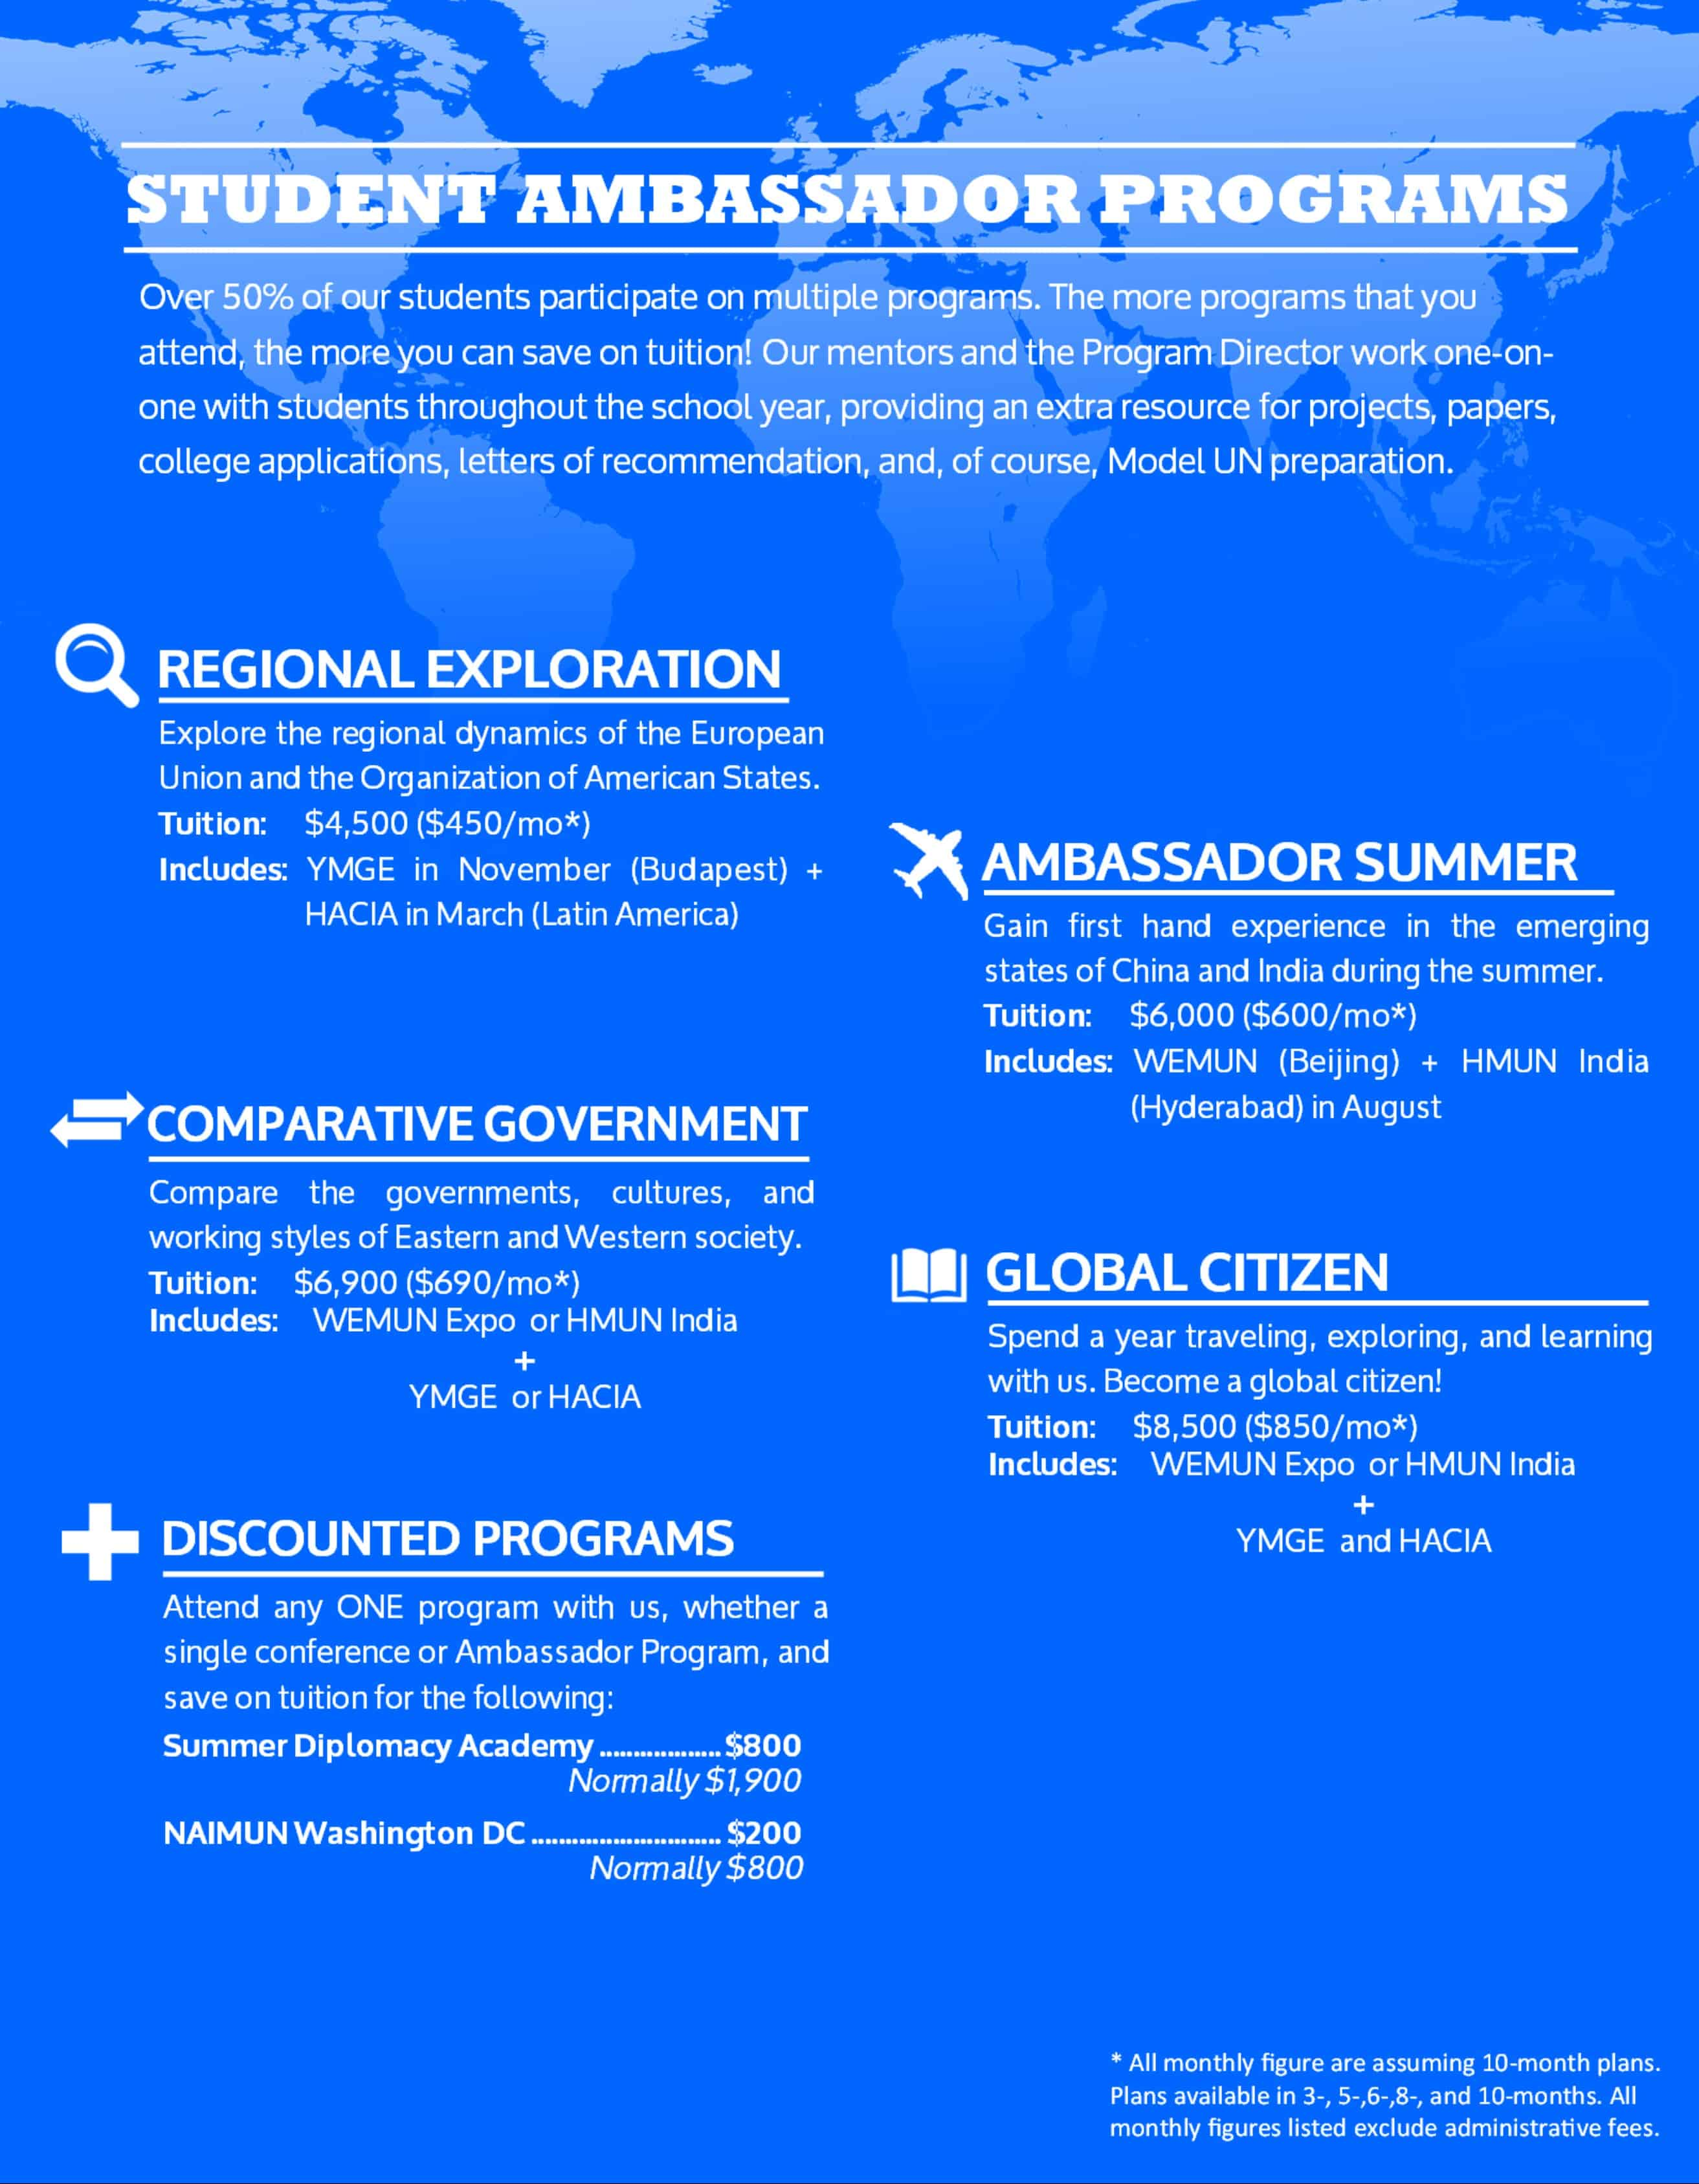 HMUN India: Hyderabad | All-American Model United Nations